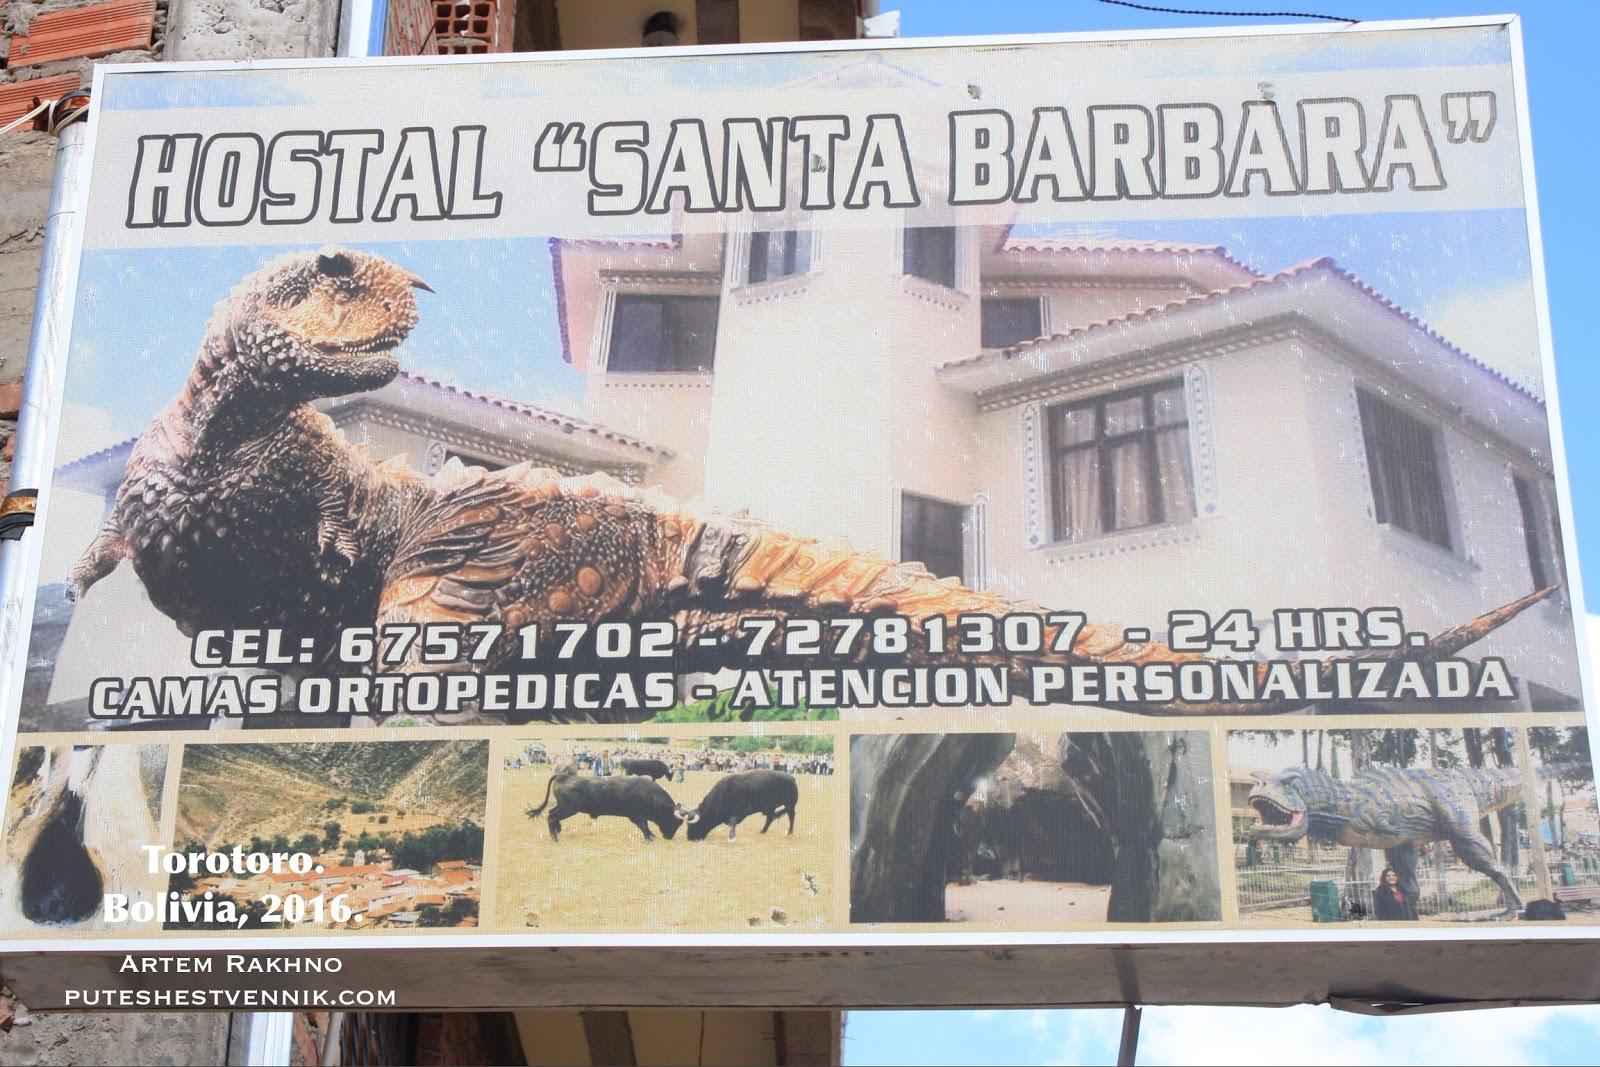 Динозавра и хостел